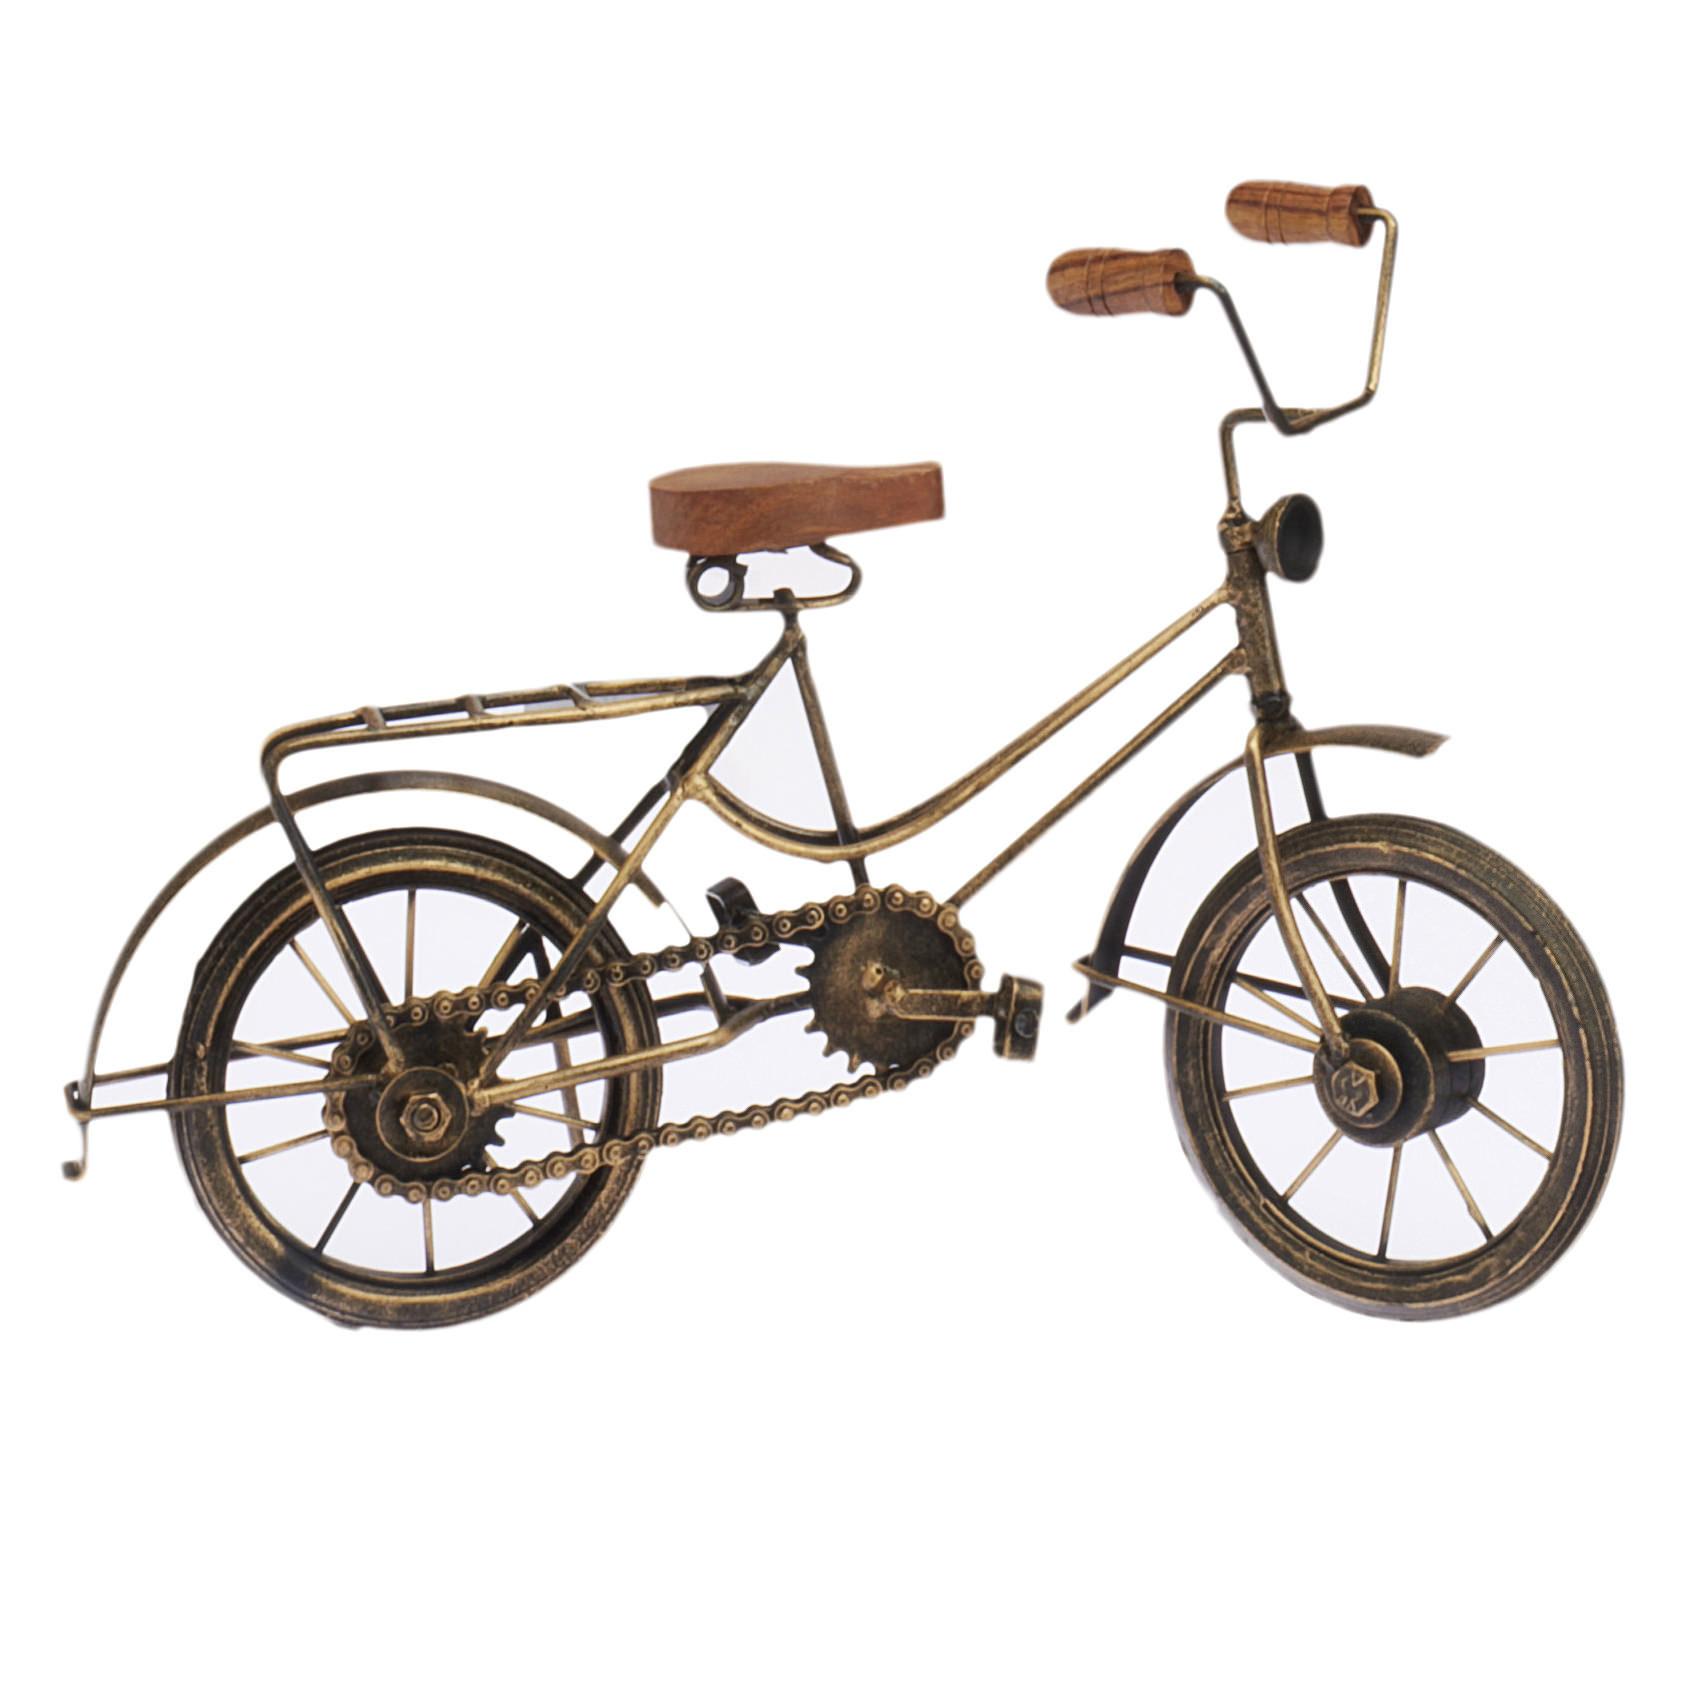 Модель велосипеда CastleДругое<br><br><br>Material: Металл<br>Length см: None<br>Width см: 36<br>Depth см: 10<br>Height см: 24